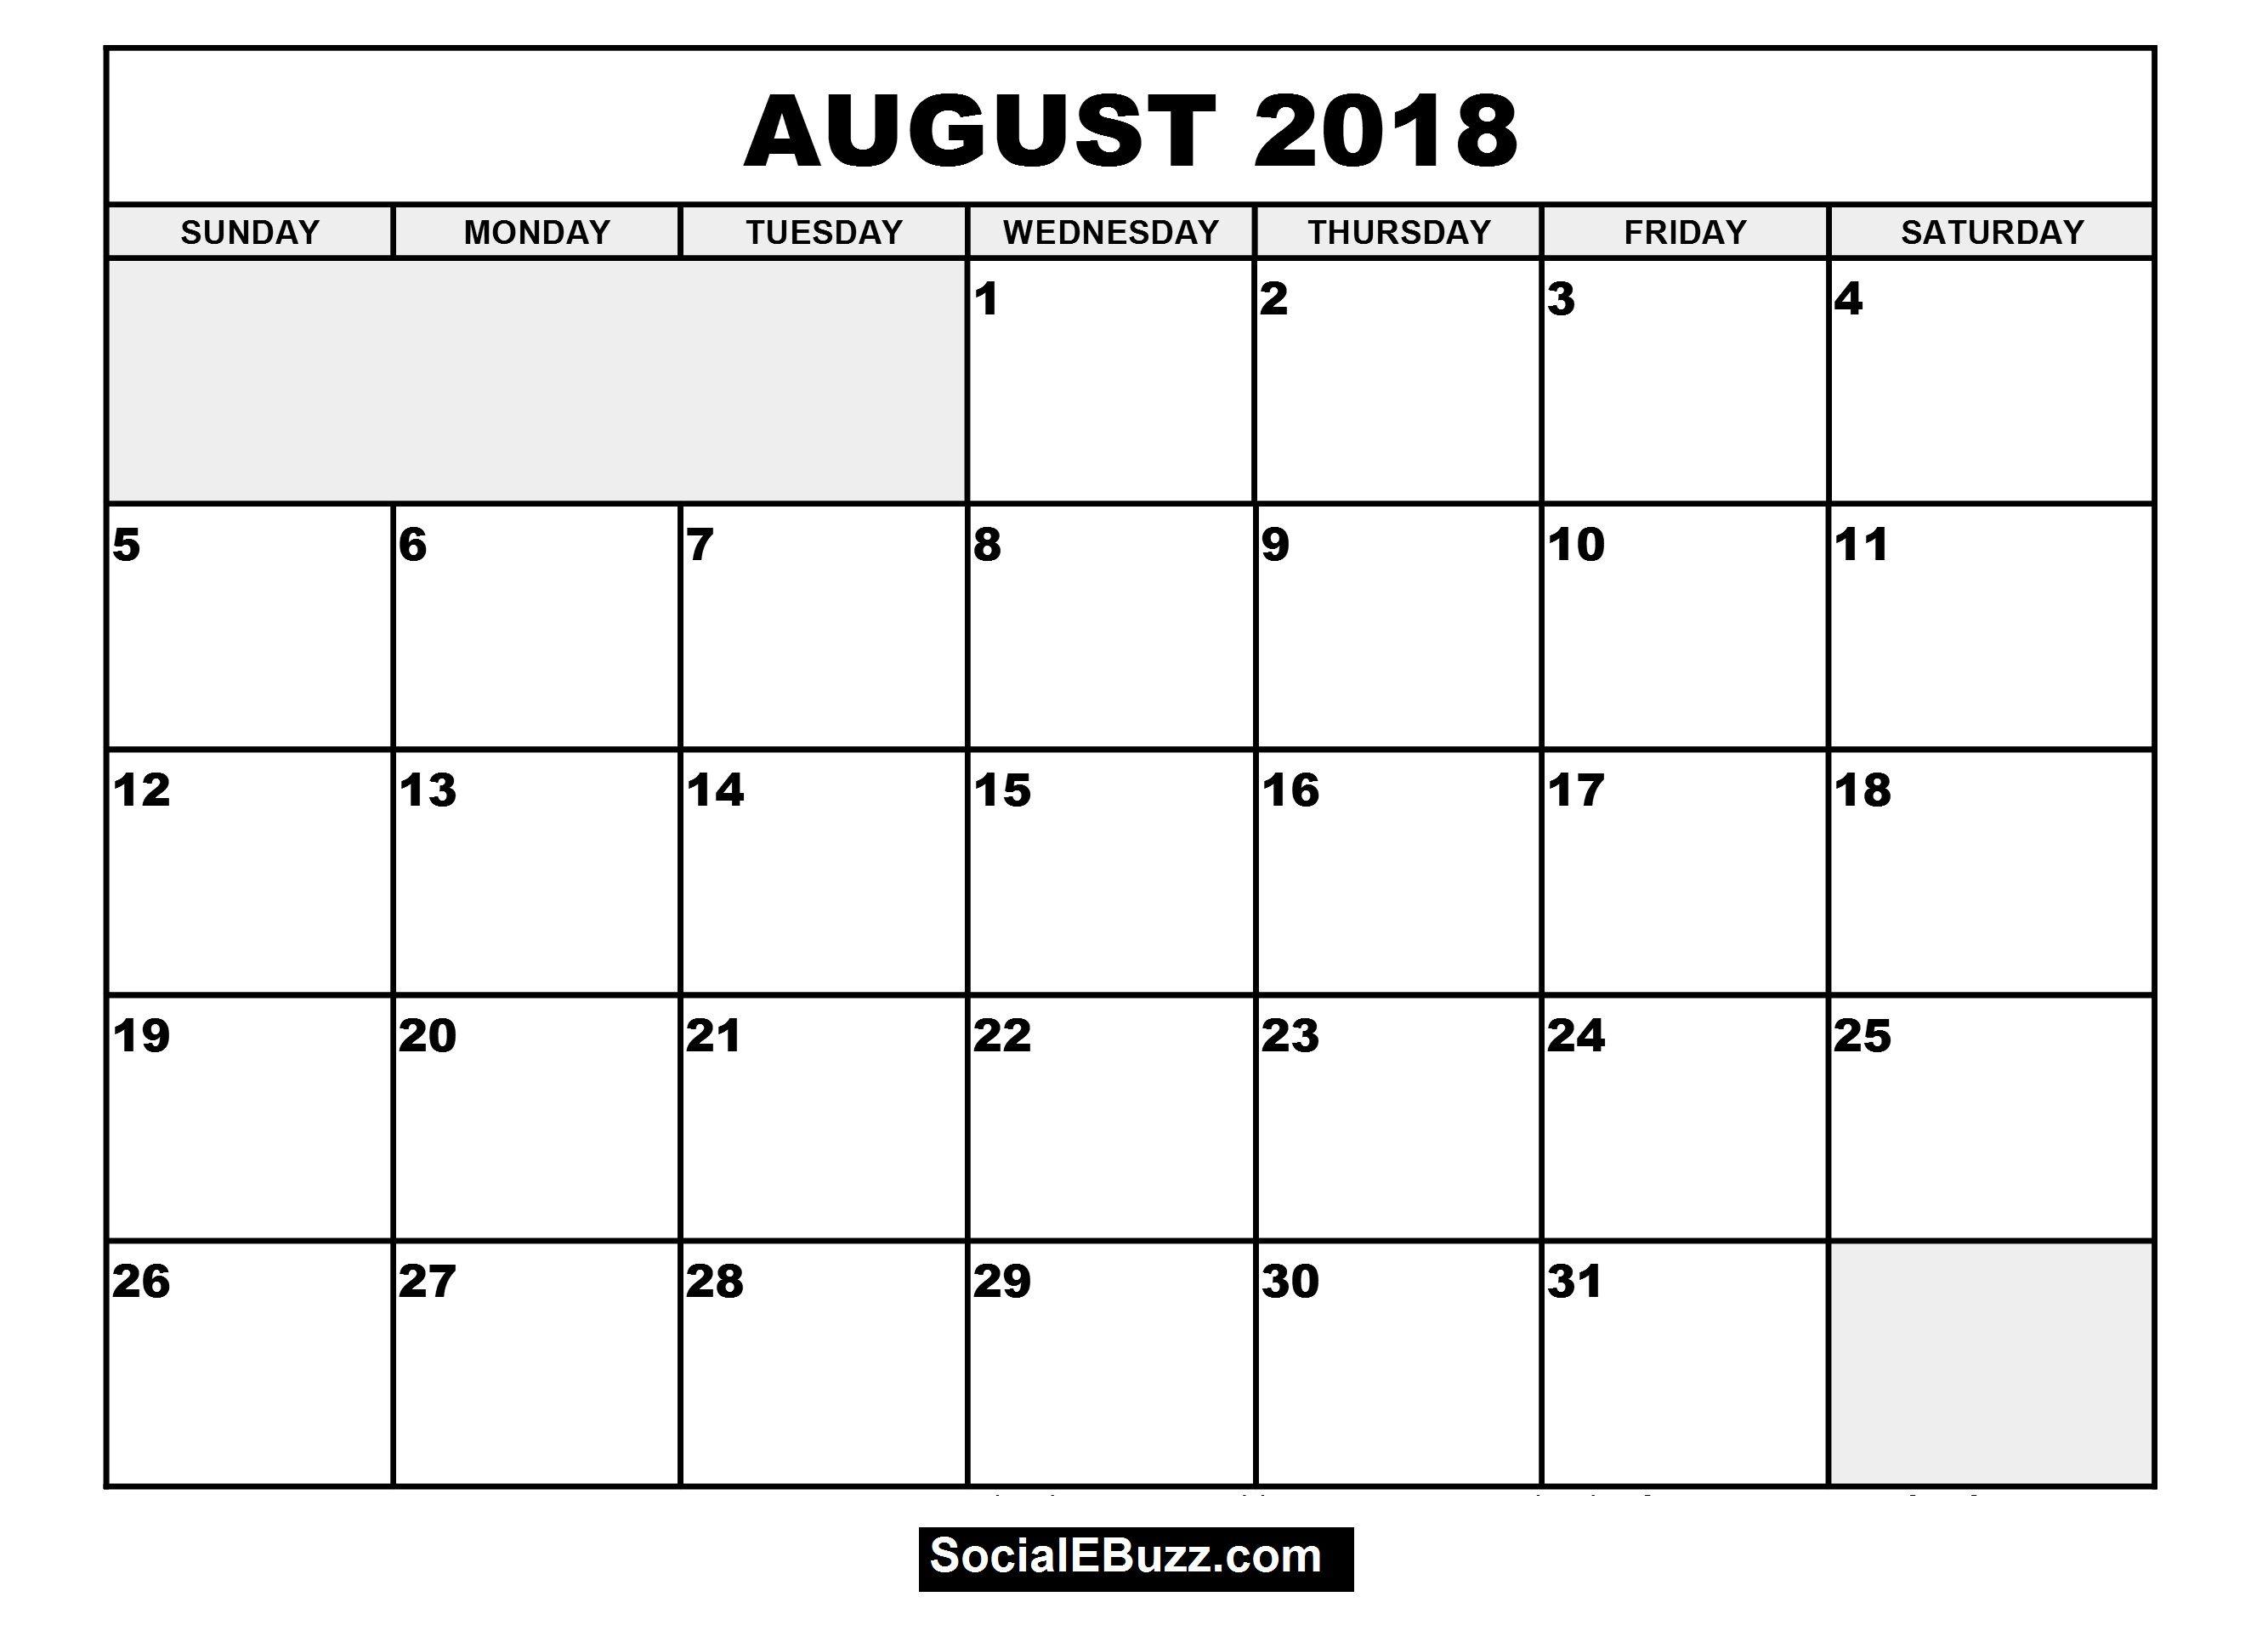 August 2018 Calendar Printable Template | August 2018 Calendar Blank intended for August Calendar Template Excel